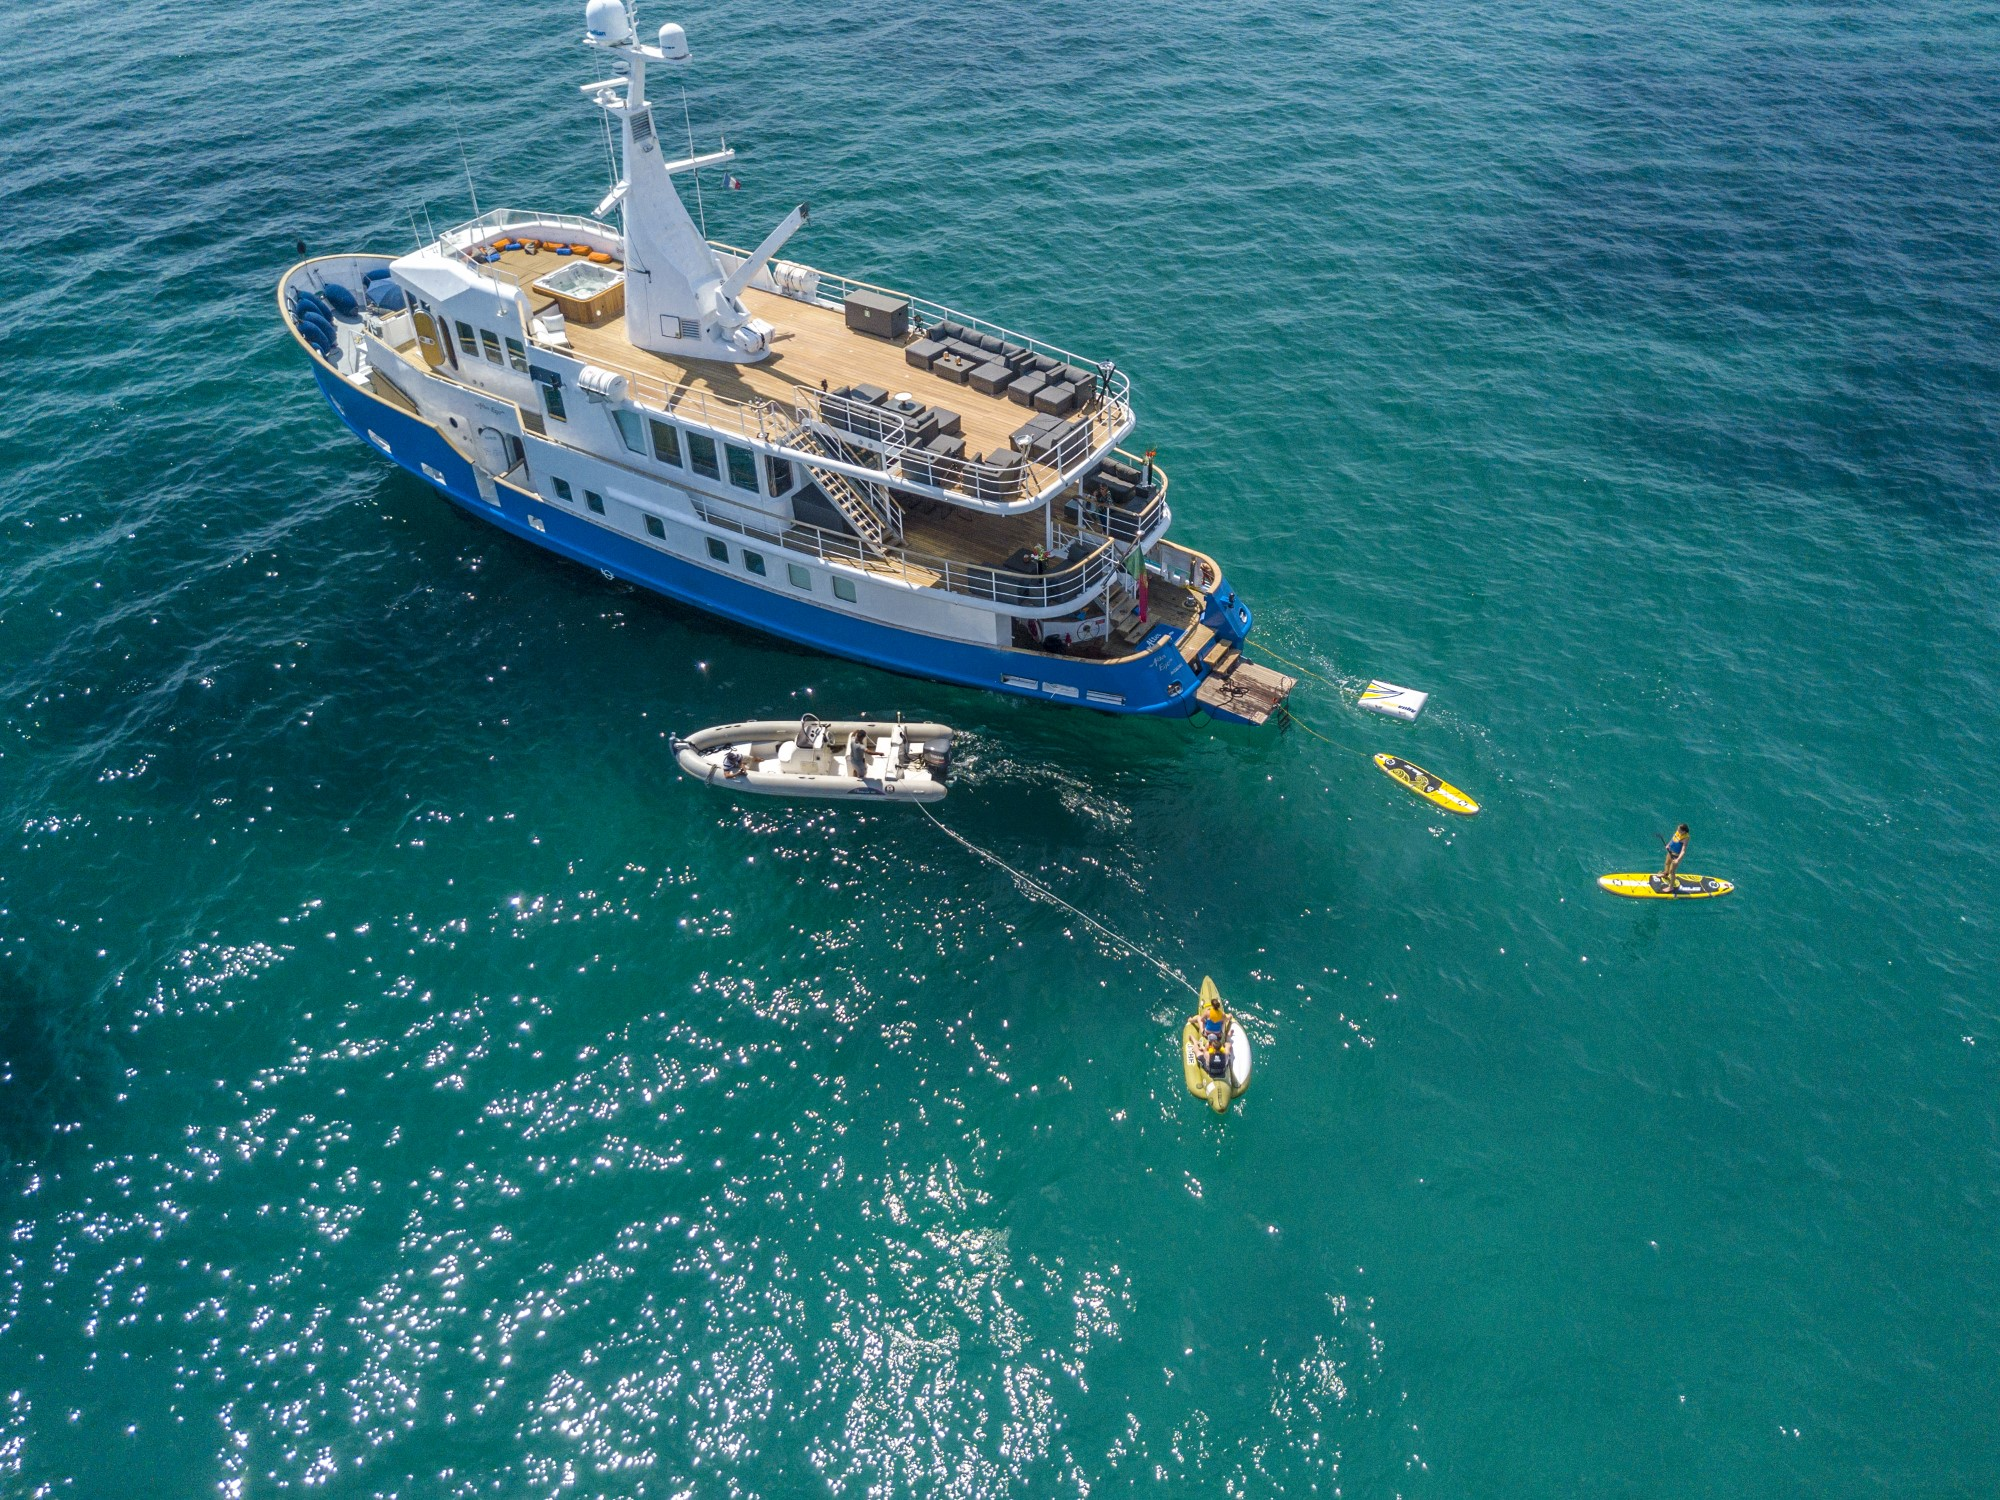 Alter Ego Yacht Charter - WGB Werft - Berlin Luxury Yacht